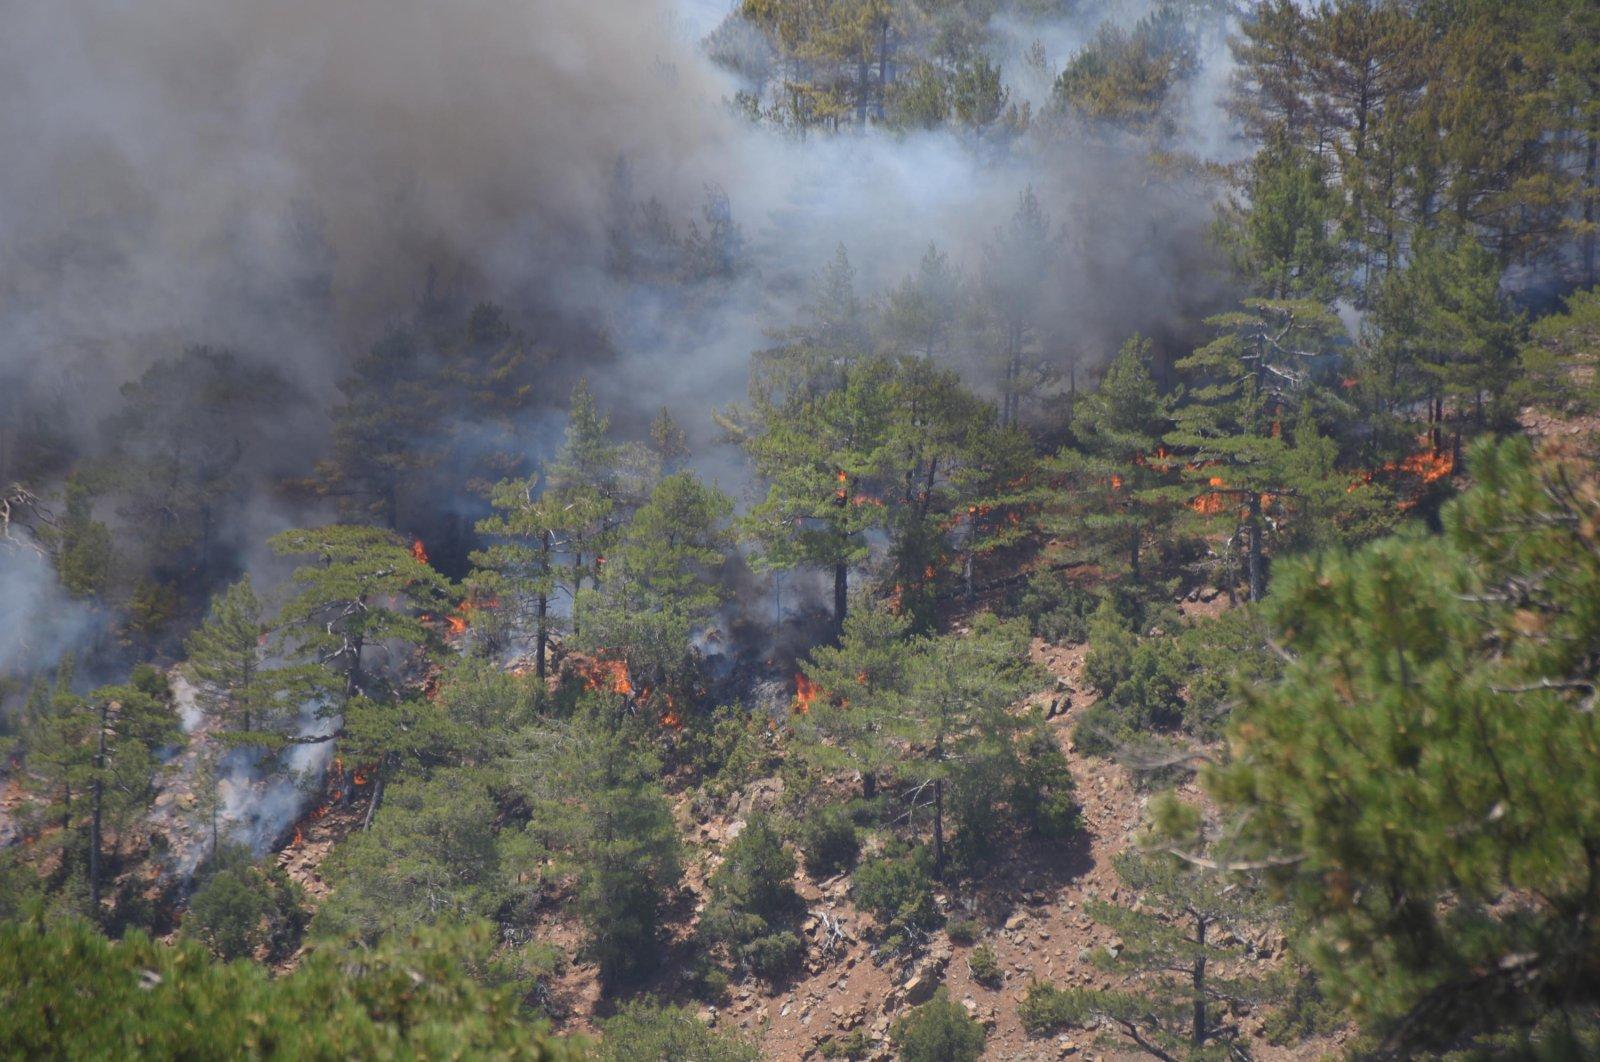 A view of the forest fire in Köyceğiz district, in Muğla, southwestern Turkey, Aug. 10, 2021. (DHA PHOTO)